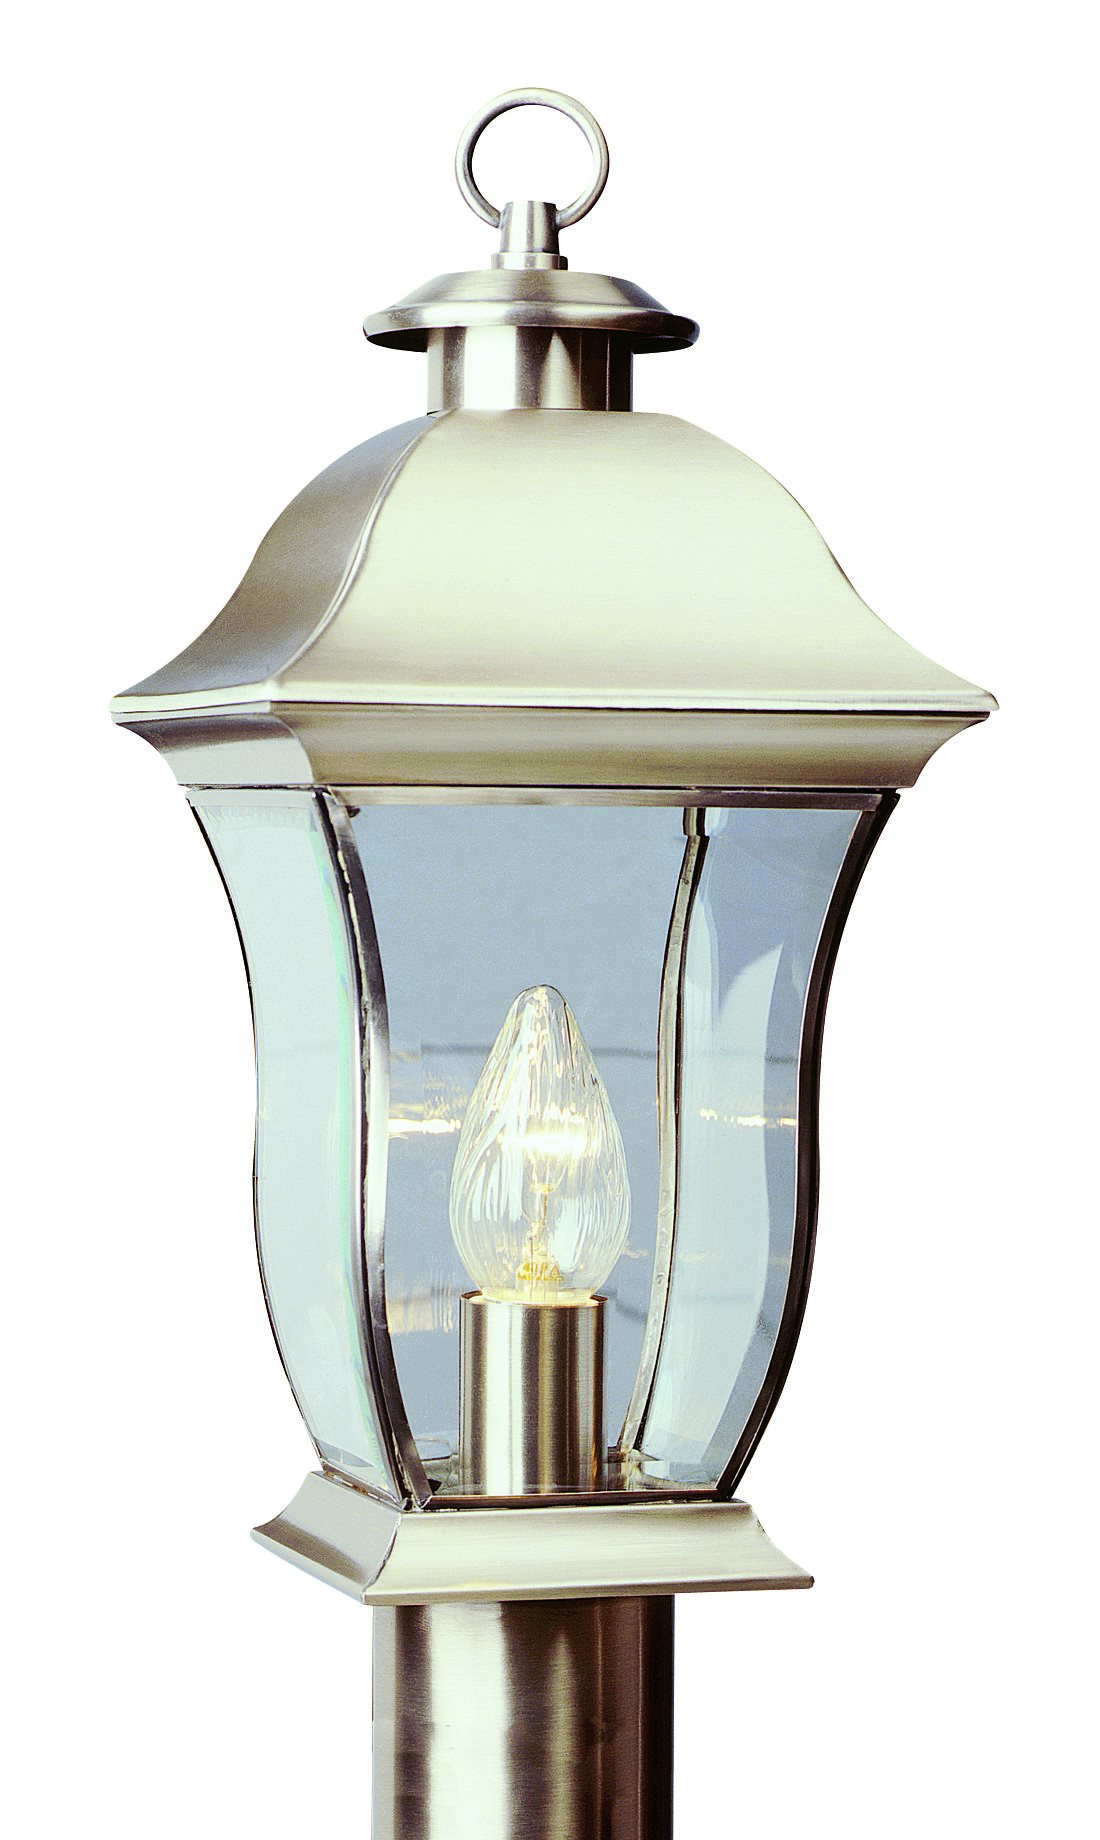 trans globe lighting 4972 transitional outdoor post. Black Bedroom Furniture Sets. Home Design Ideas